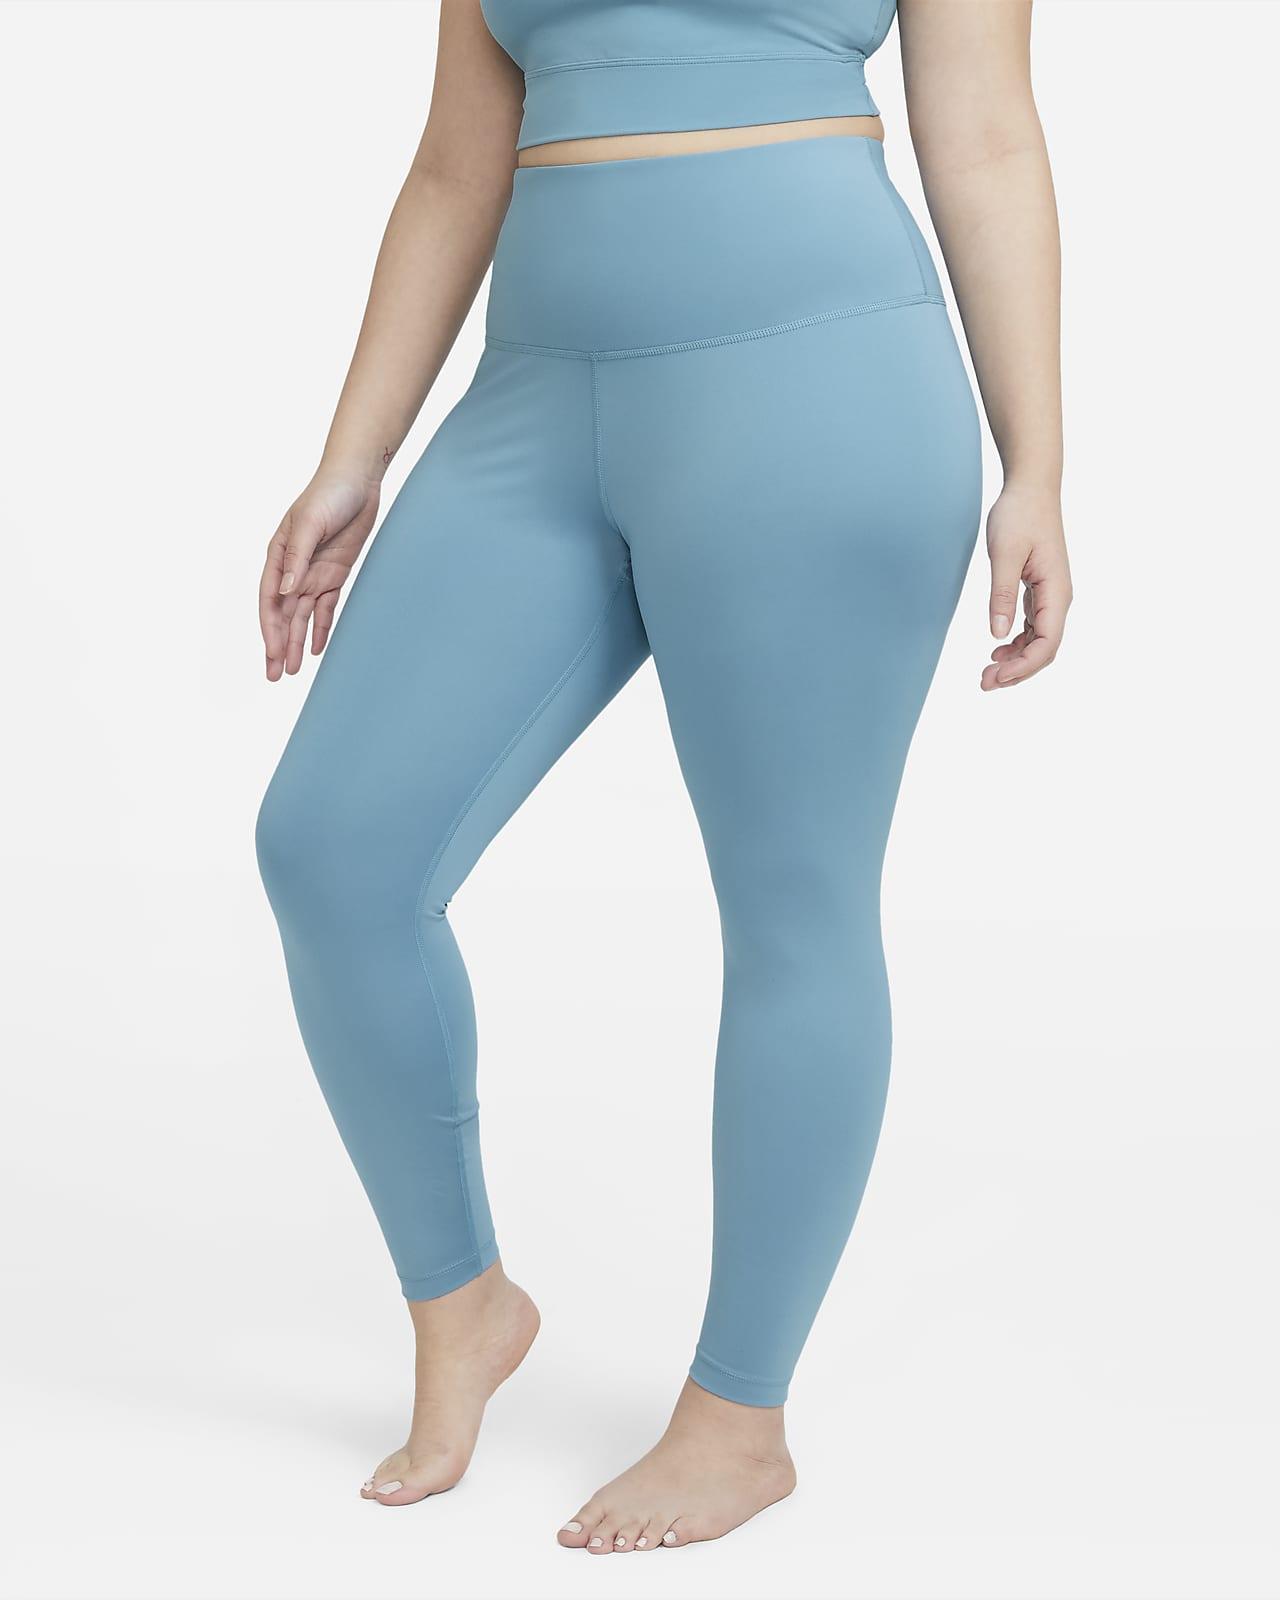 Legging 7/8 taille haute Nike Yoga pour Femme (grande taille)